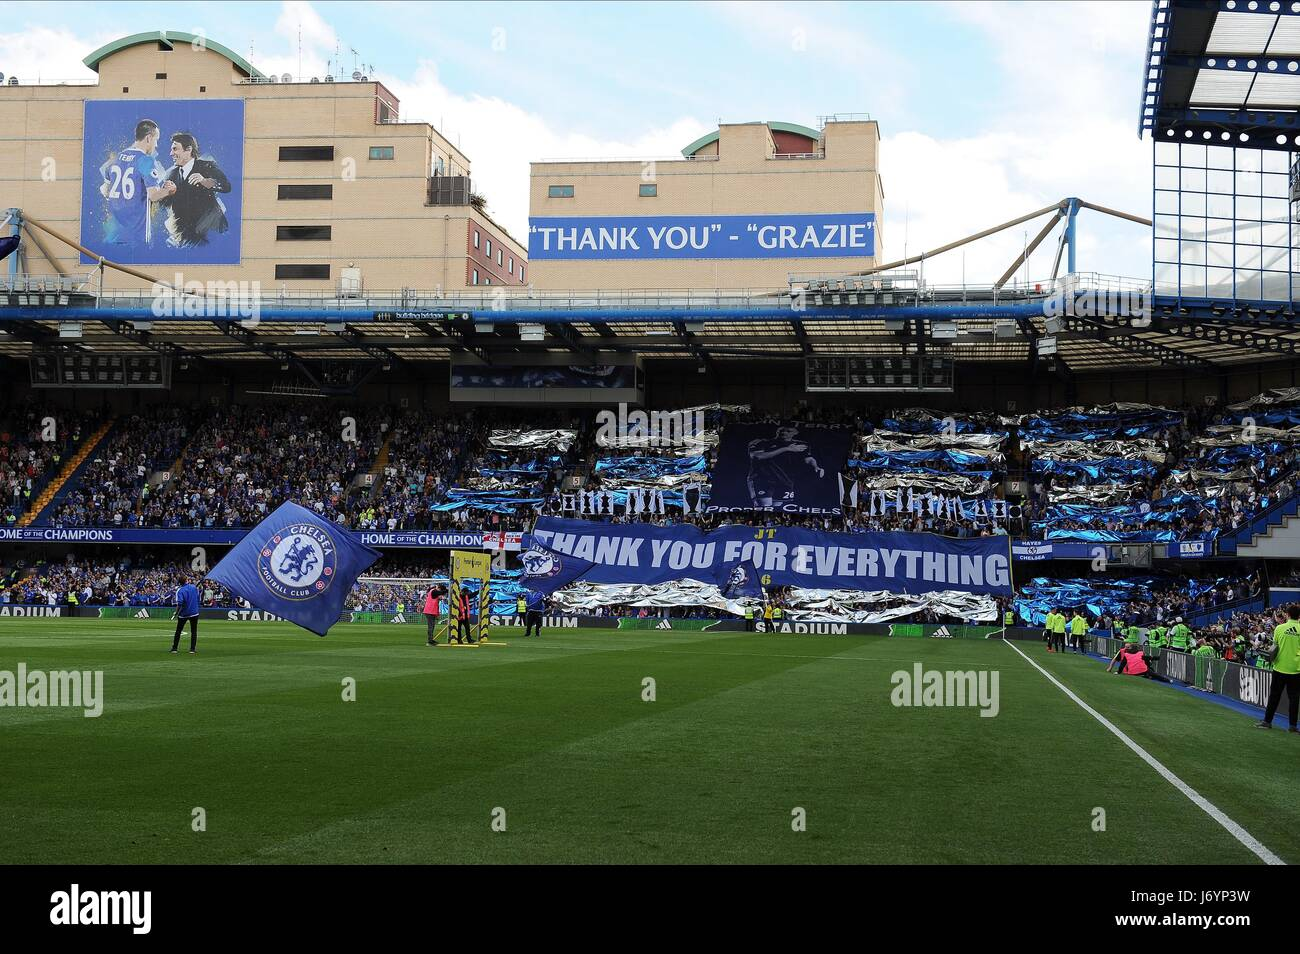 El Chelsea aficionados dicen adiós CHELSEA V SUNDERLAND Stamford Bridge Stadium de Londres, Inglaterra el 21 Imagen De Stock